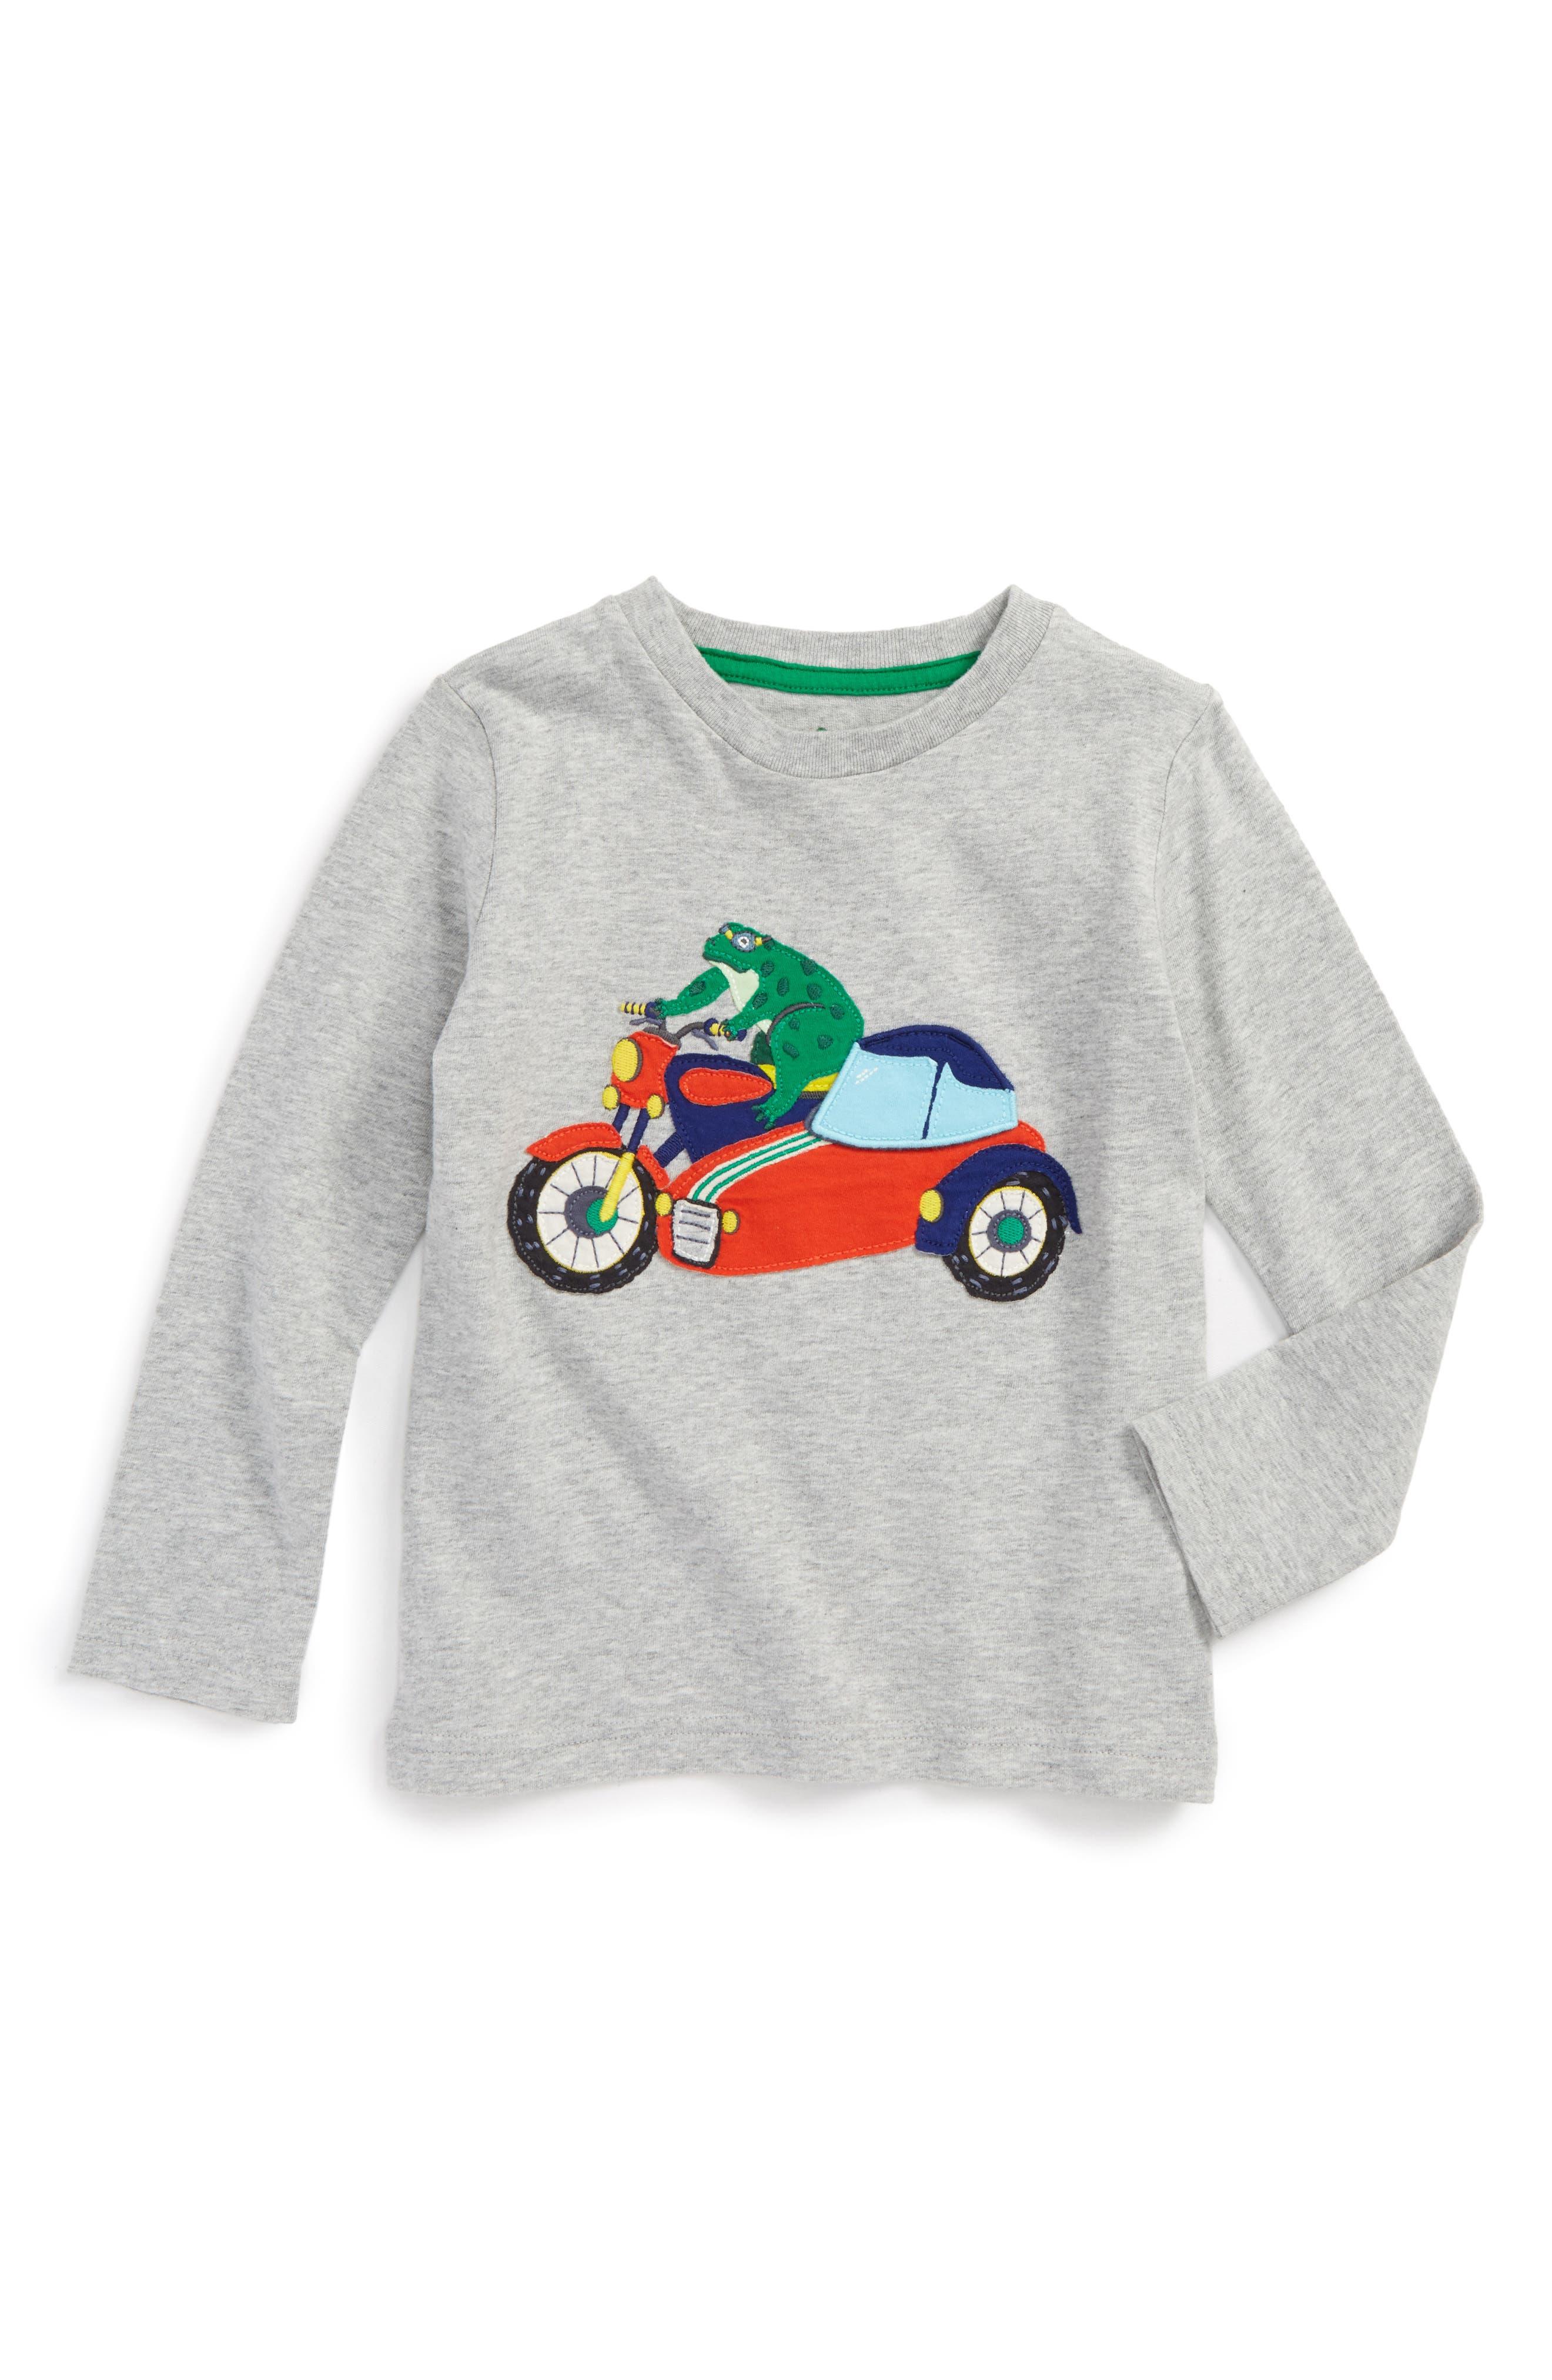 Novelty Vehicle T-Shirt,                         Main,                         color, 062